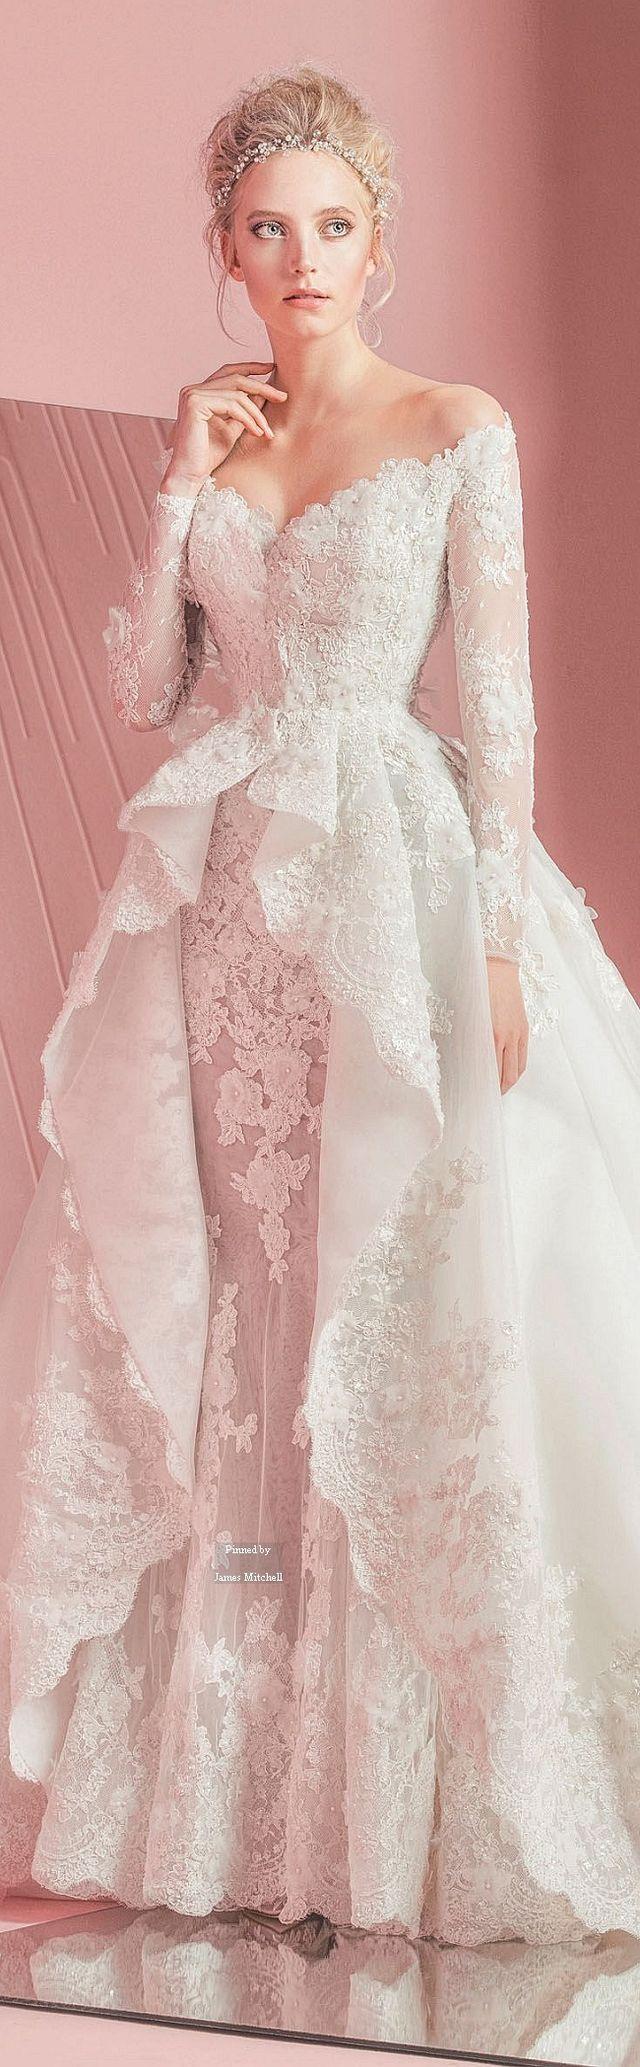 Bridesmaid dresses 2018 summer hairstyles